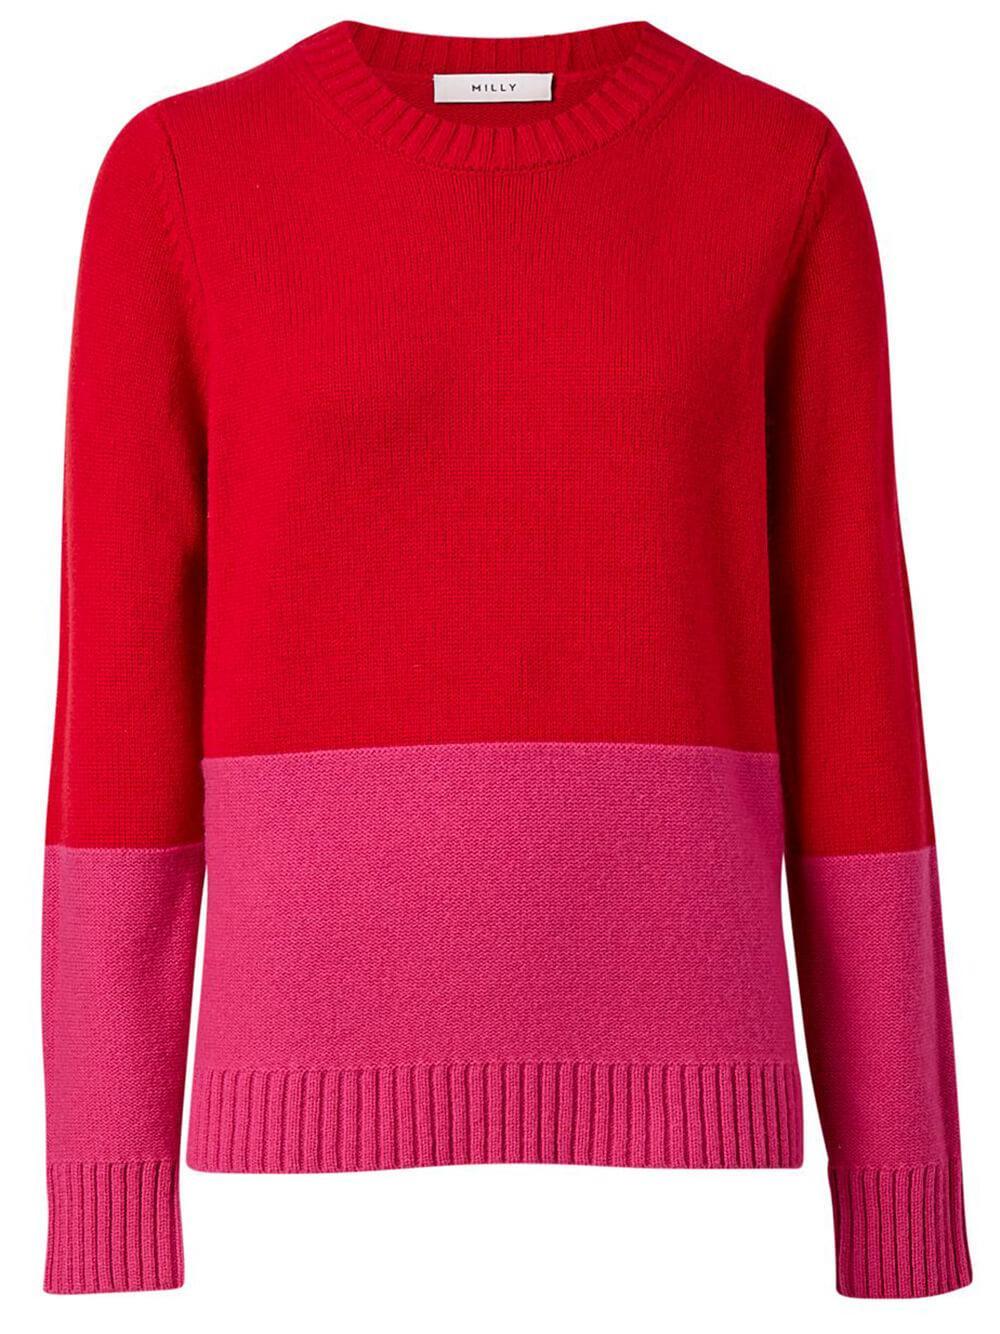 Colorblock Crew Neck Sweater Item # KST204